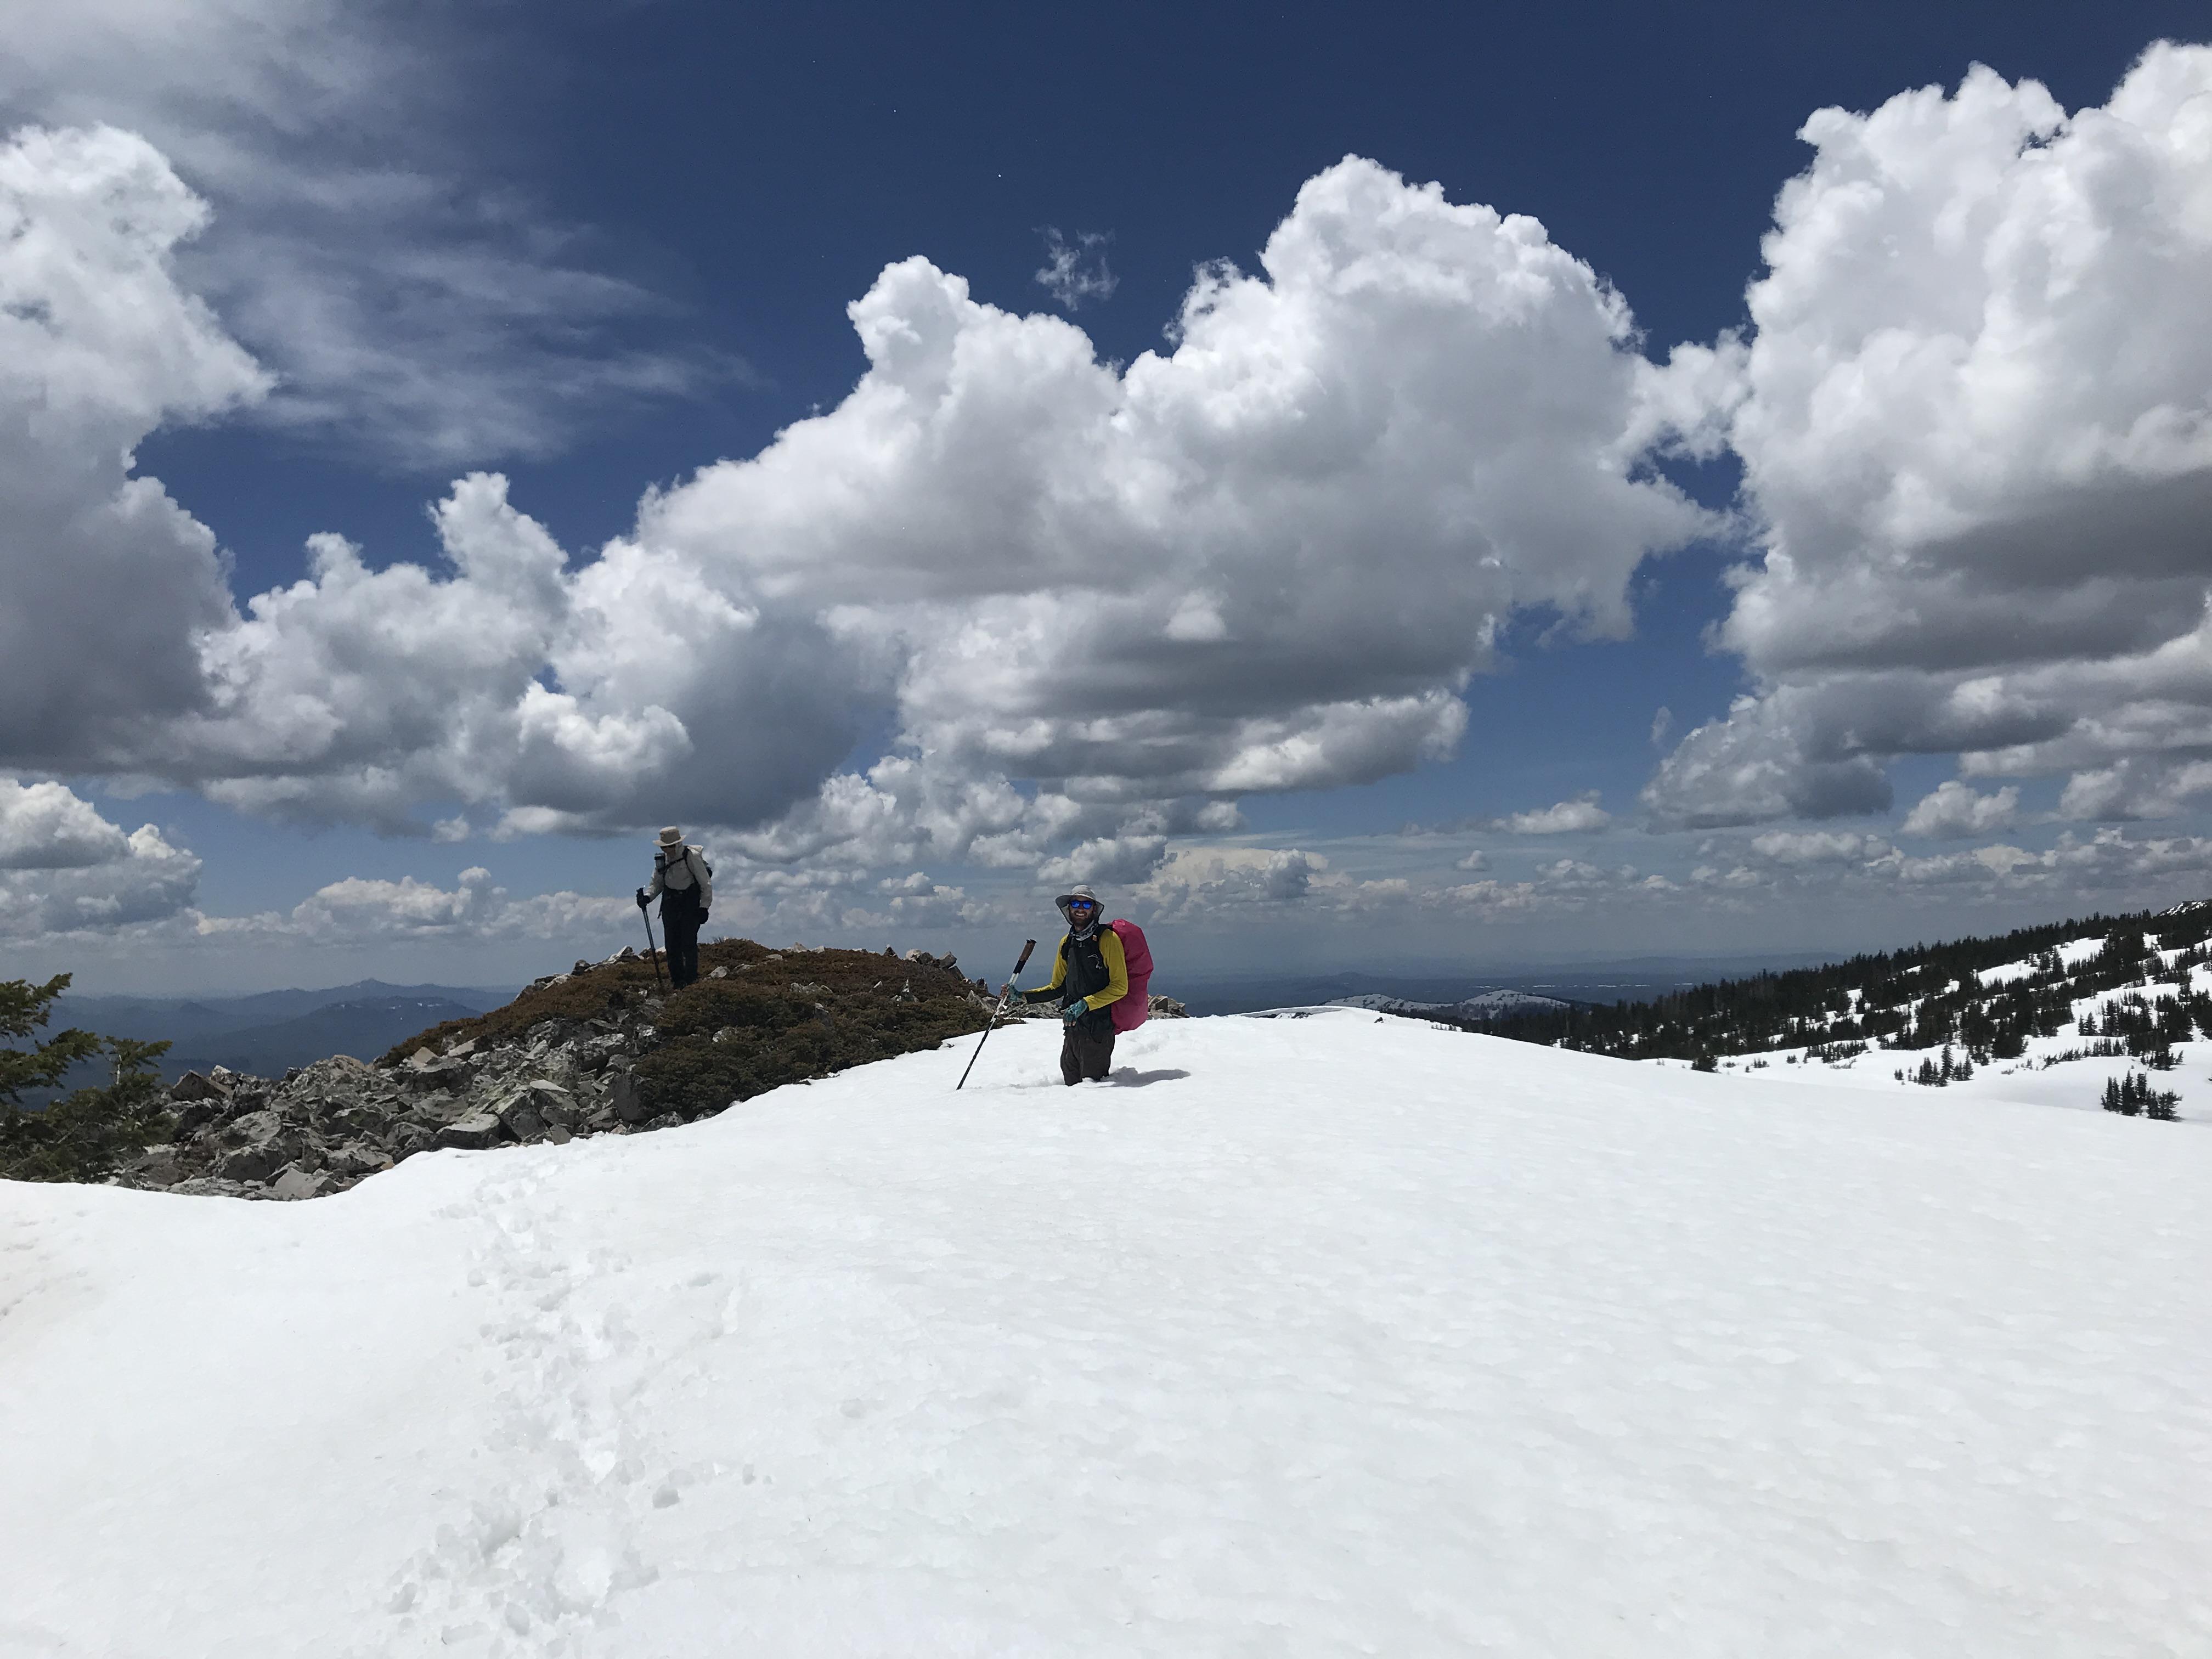 Bonnymans snow foam